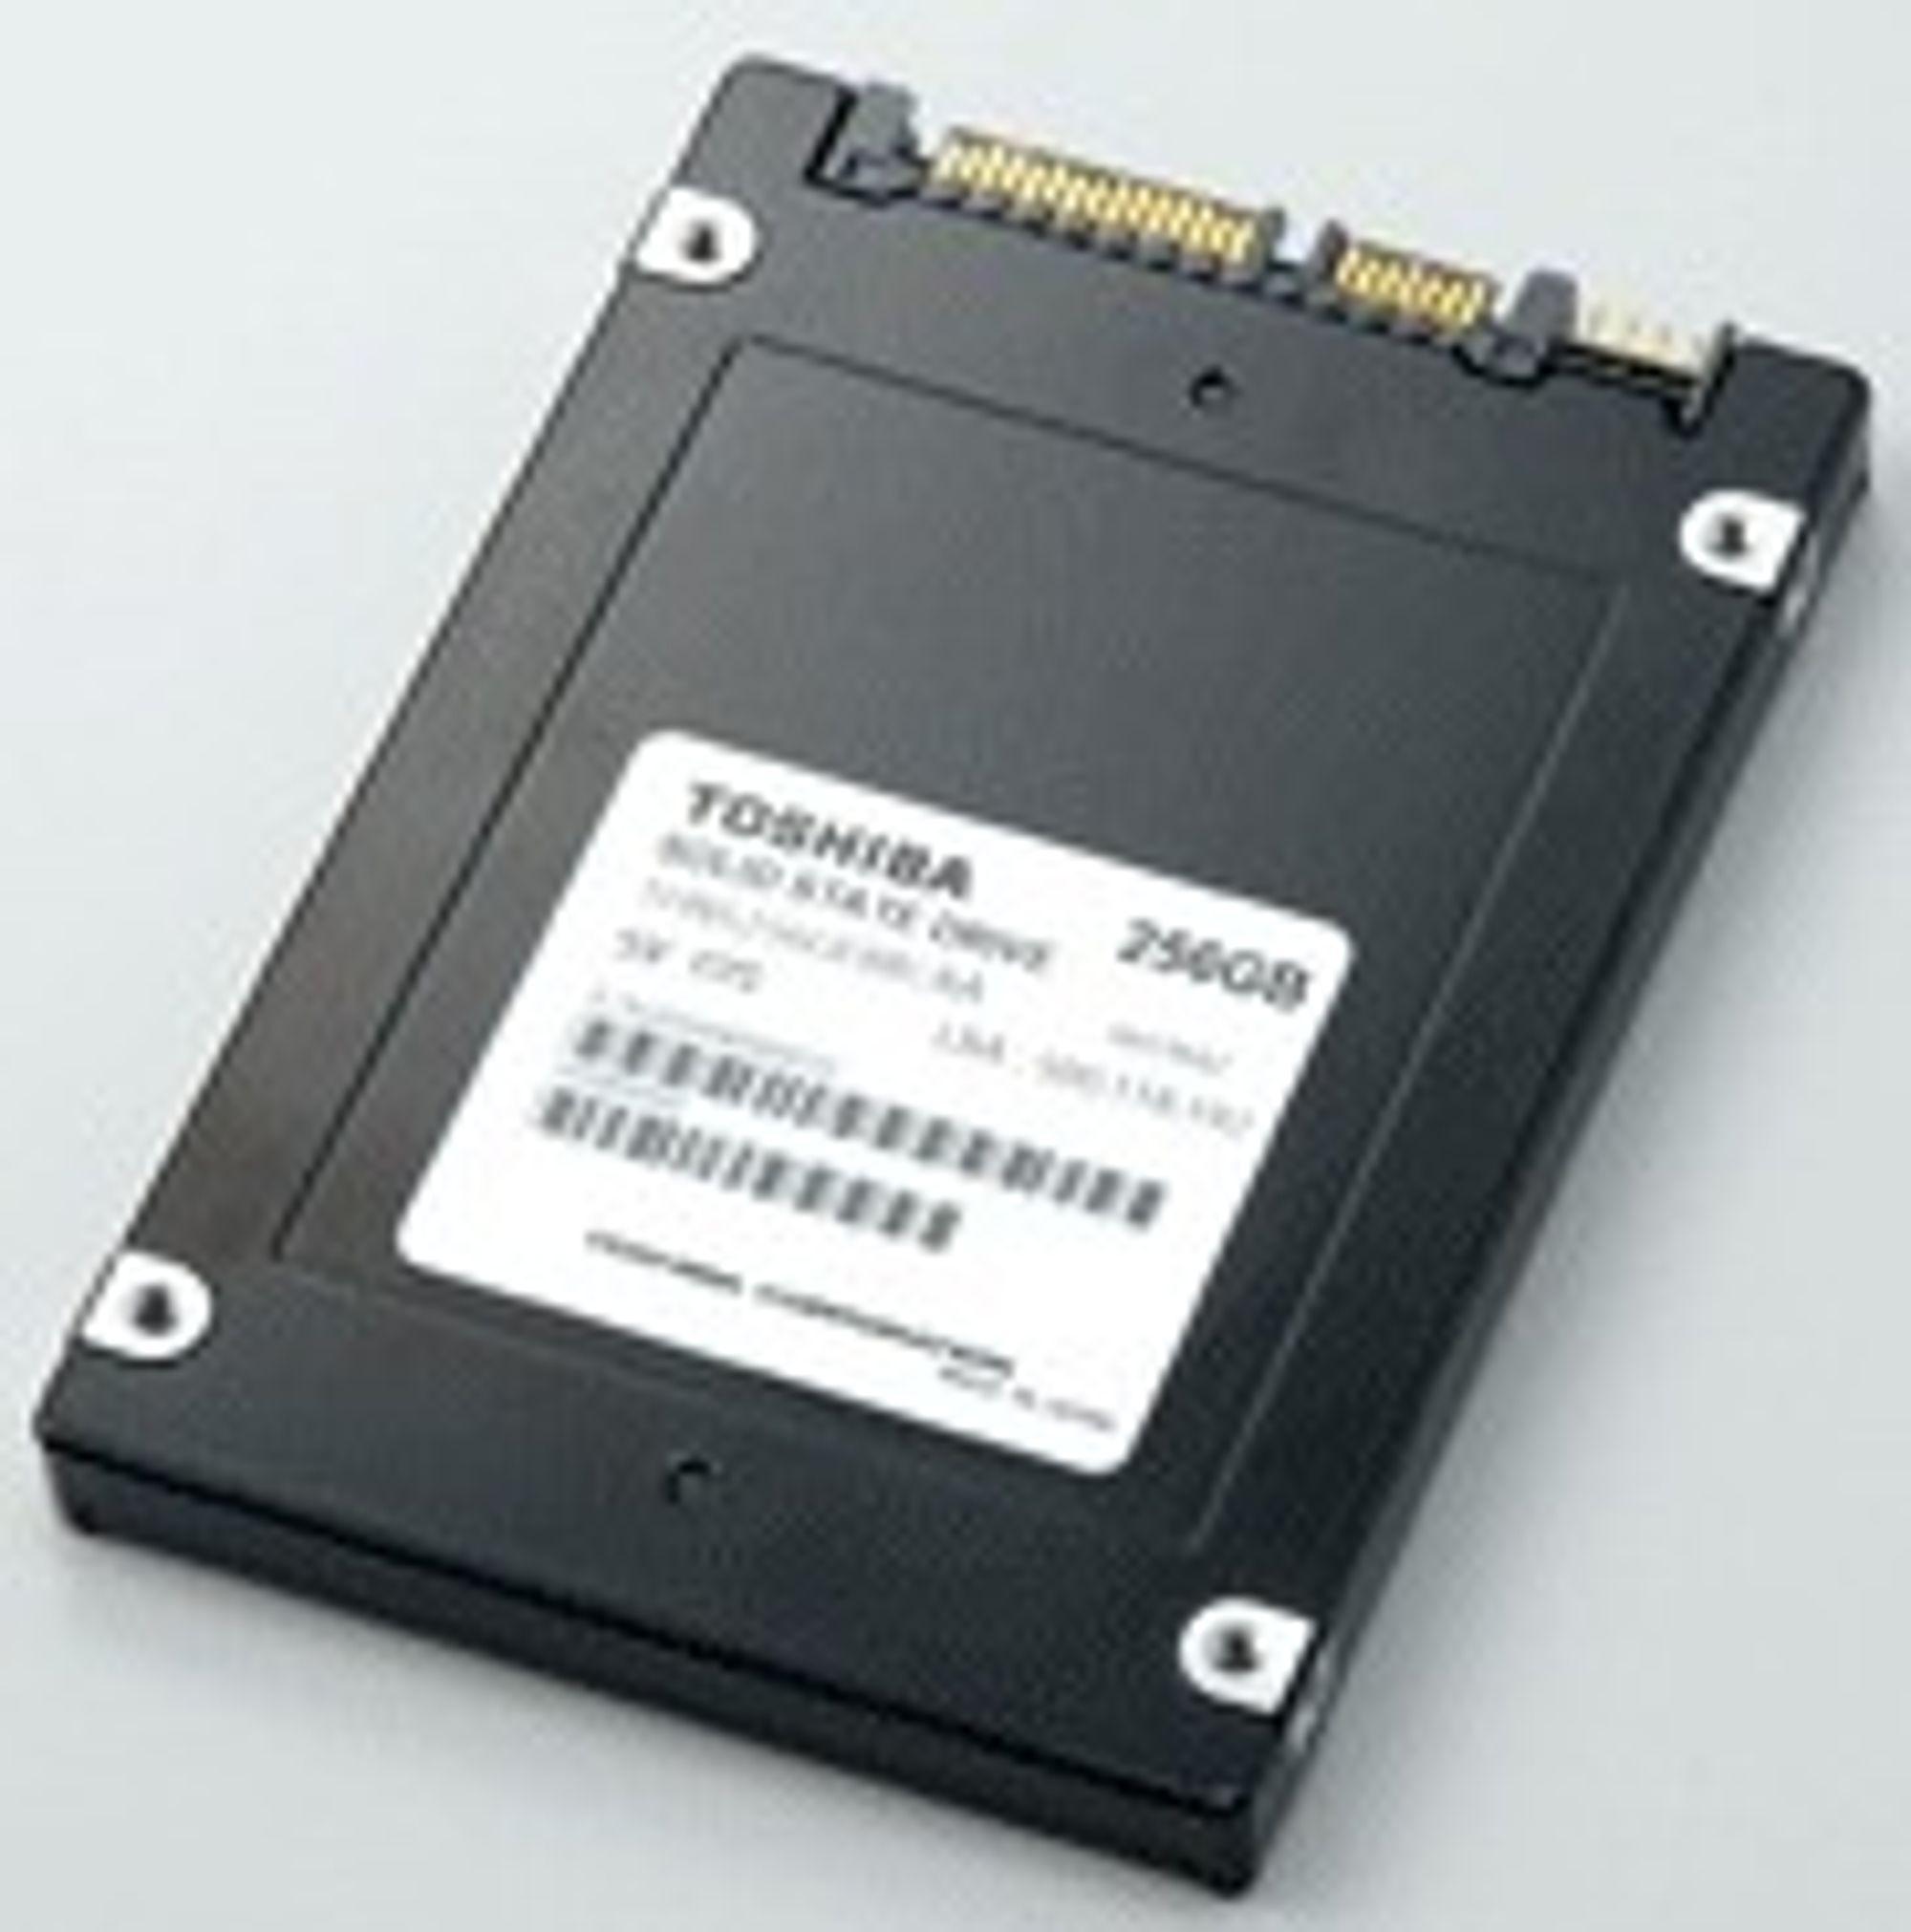 256 GB SSD fra Toshiba